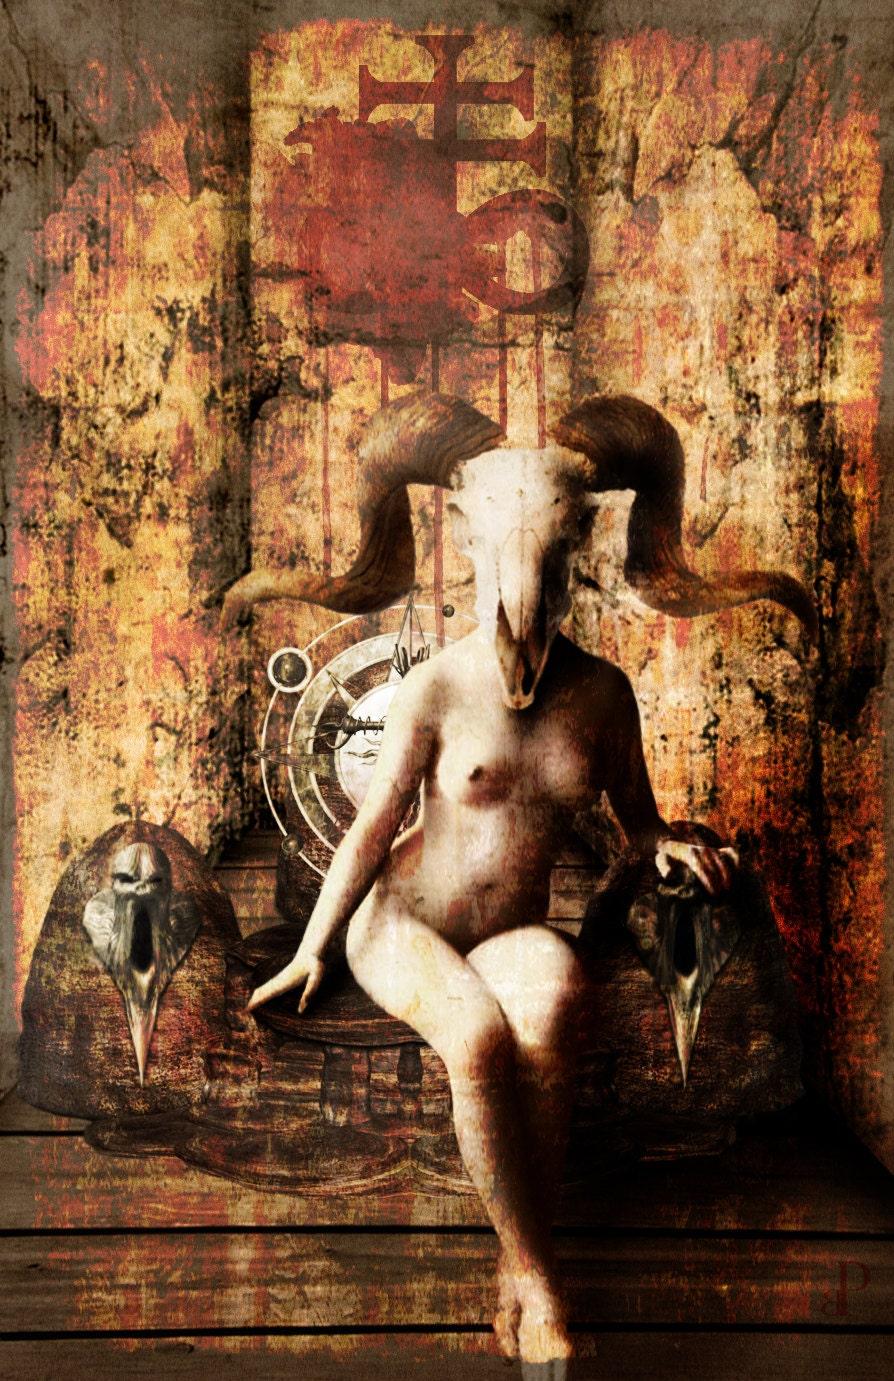 Erotic demon pictures sexual videos